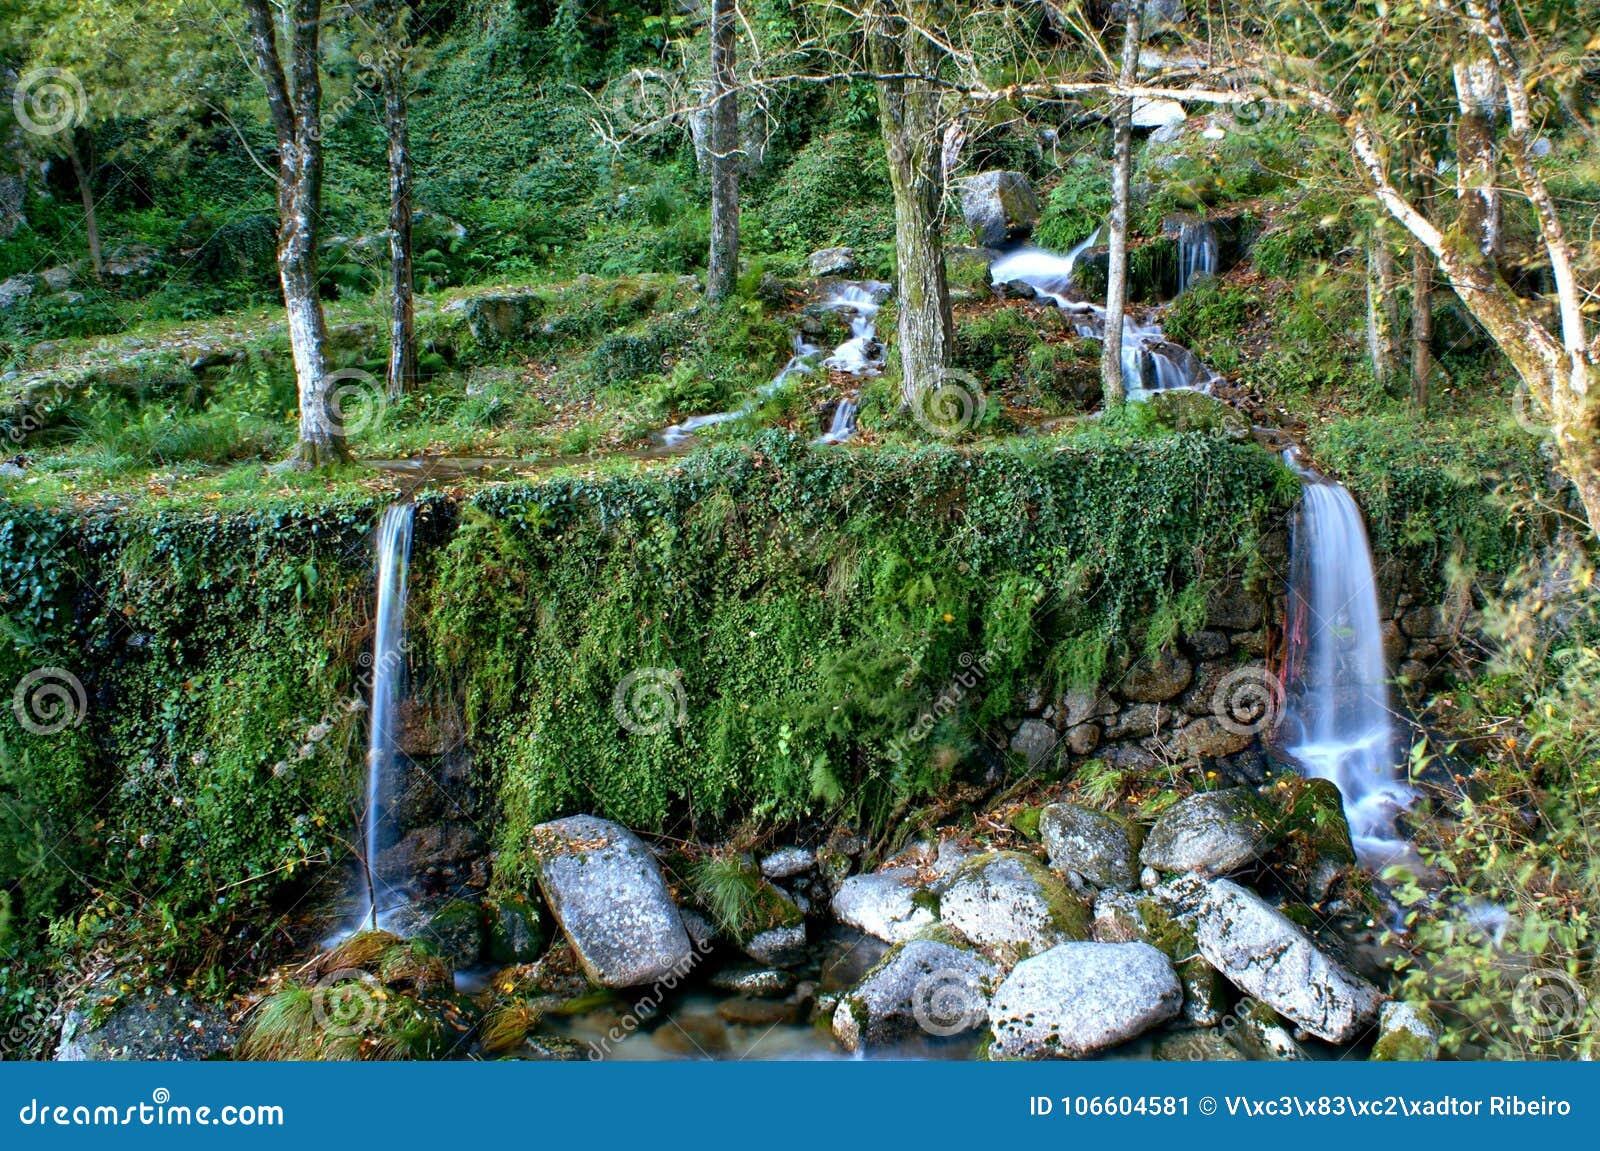 Waterfall in National Park of Peneda Geres